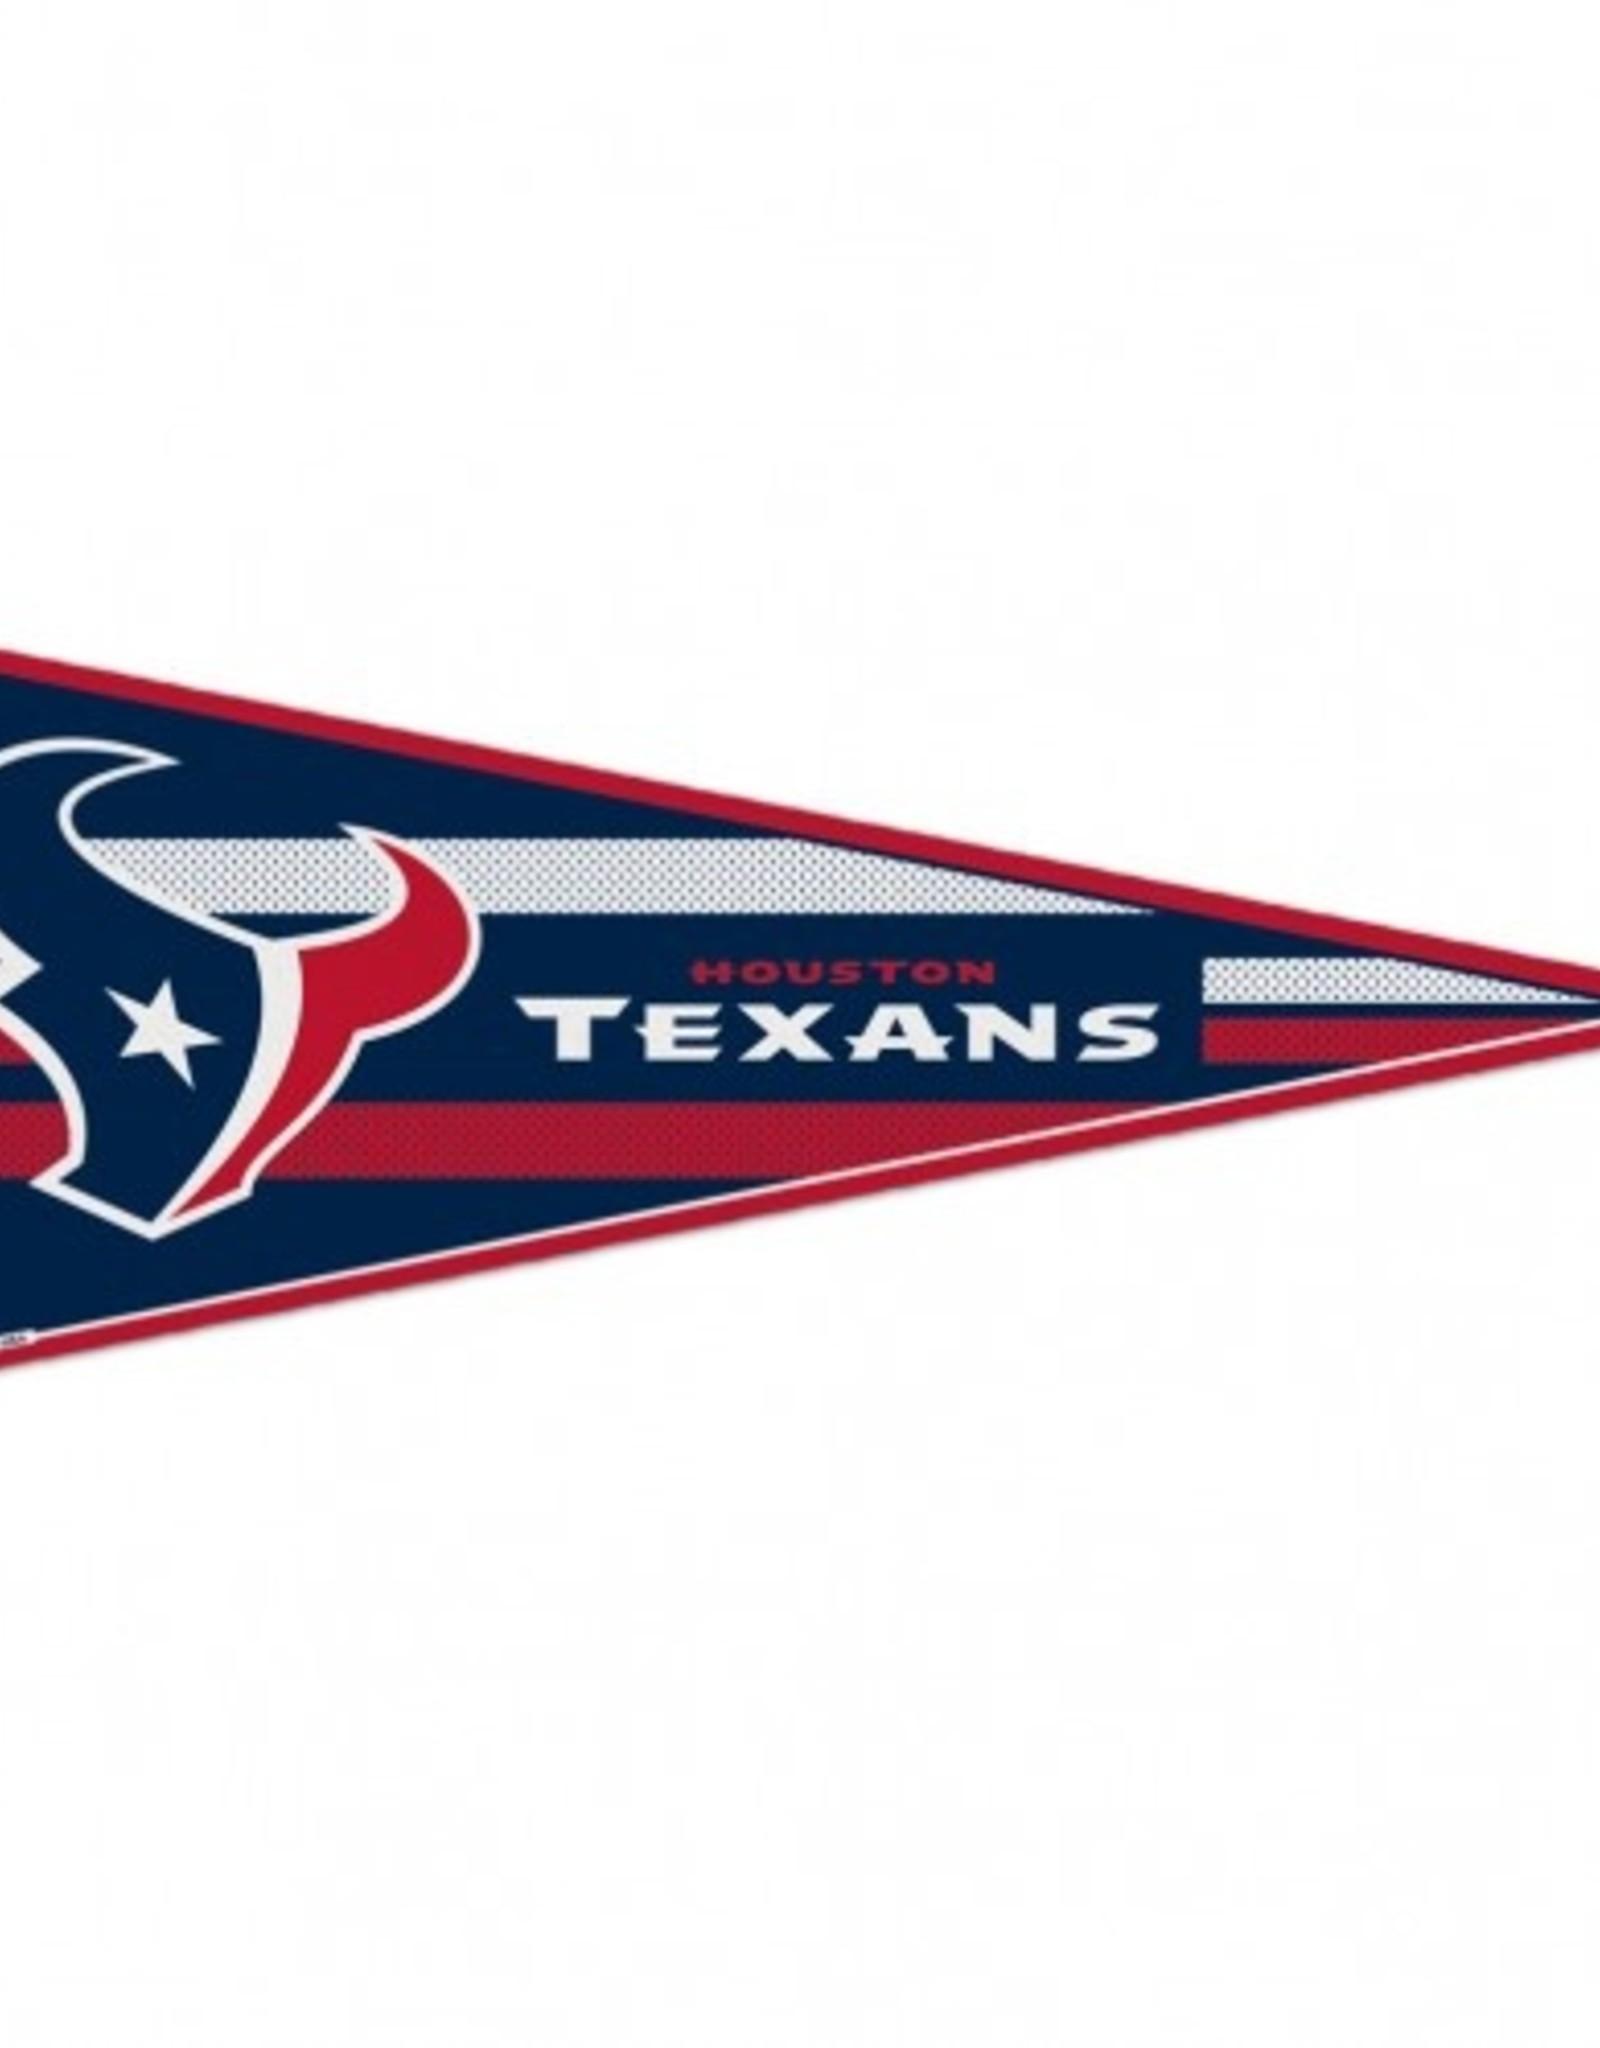 "Houston Texans 12""x30"" Classic Pennant"